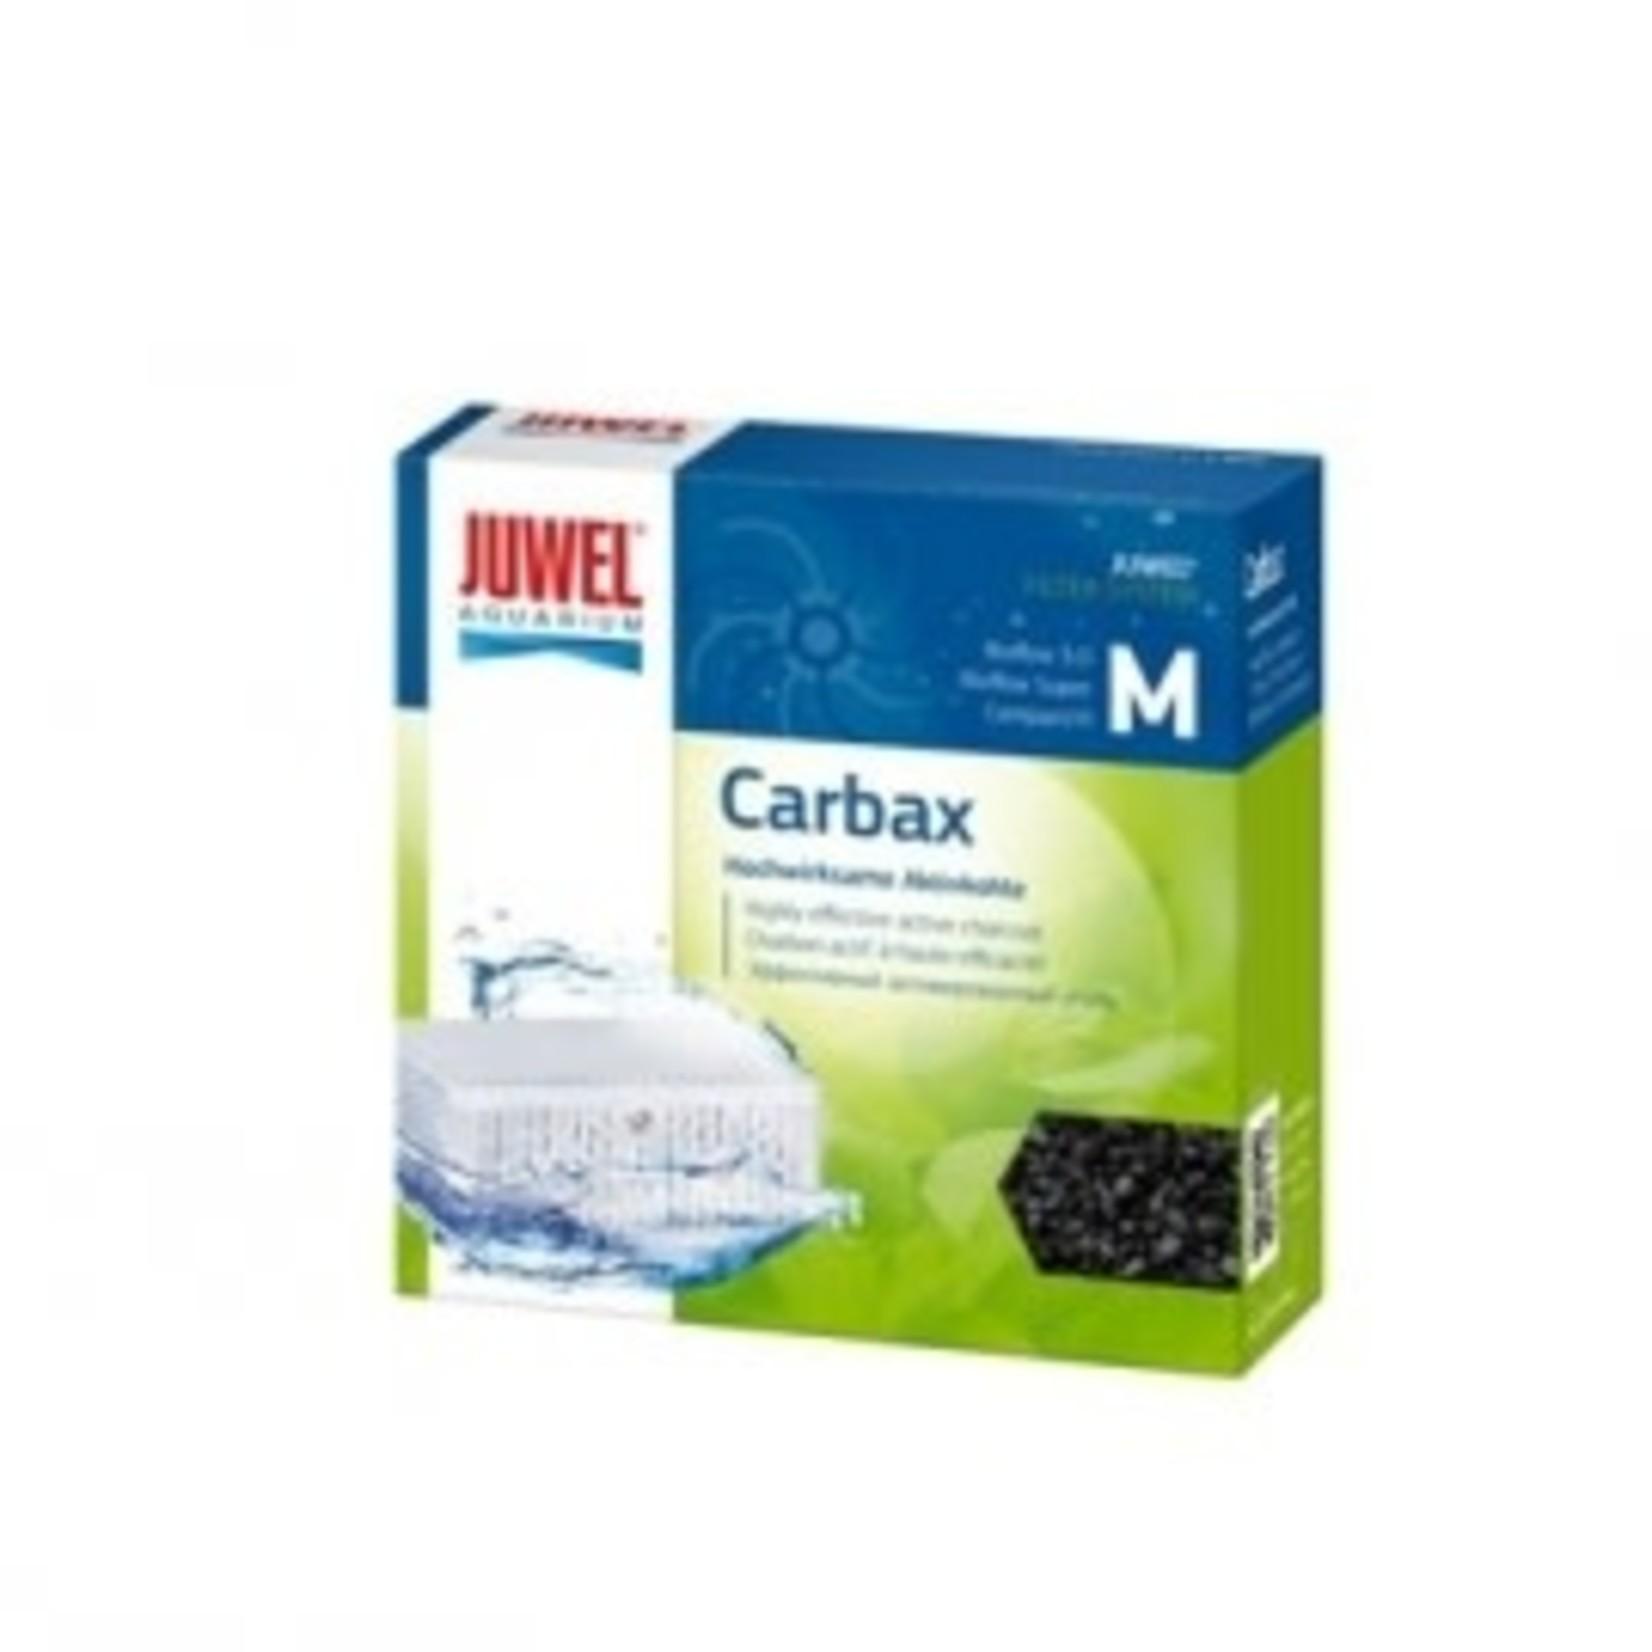 Juwel CARBAX Bioflow Juwel